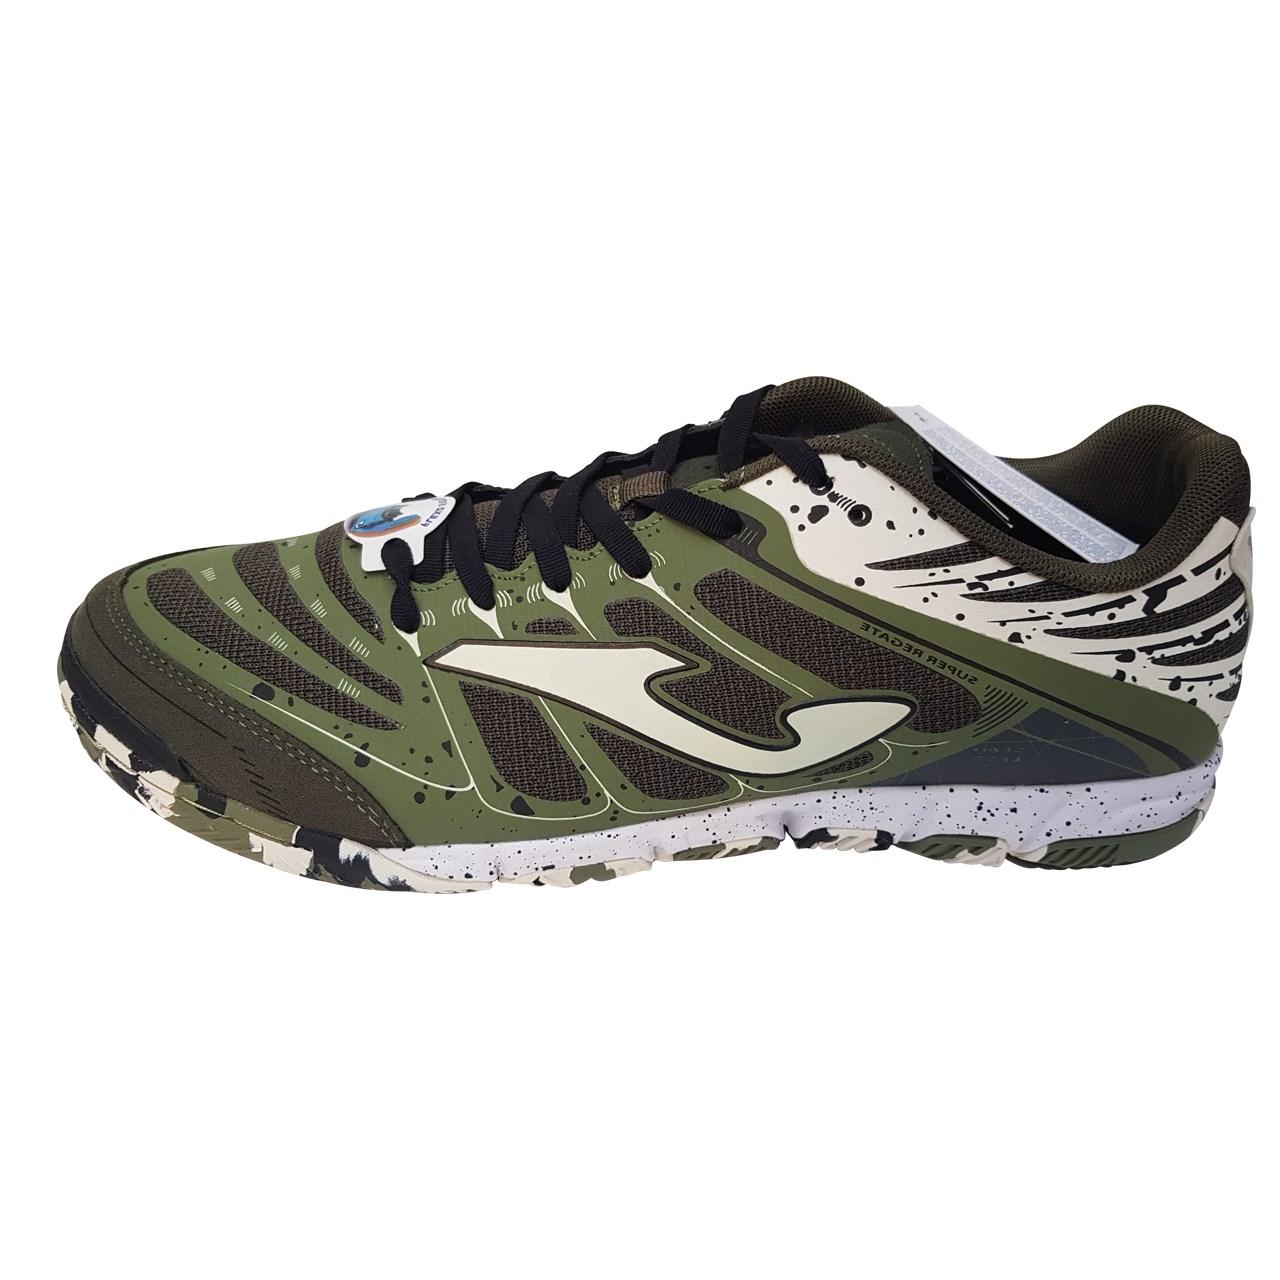 قیمت کفش فوتسال مردانه جوما مدل Super Regate 823